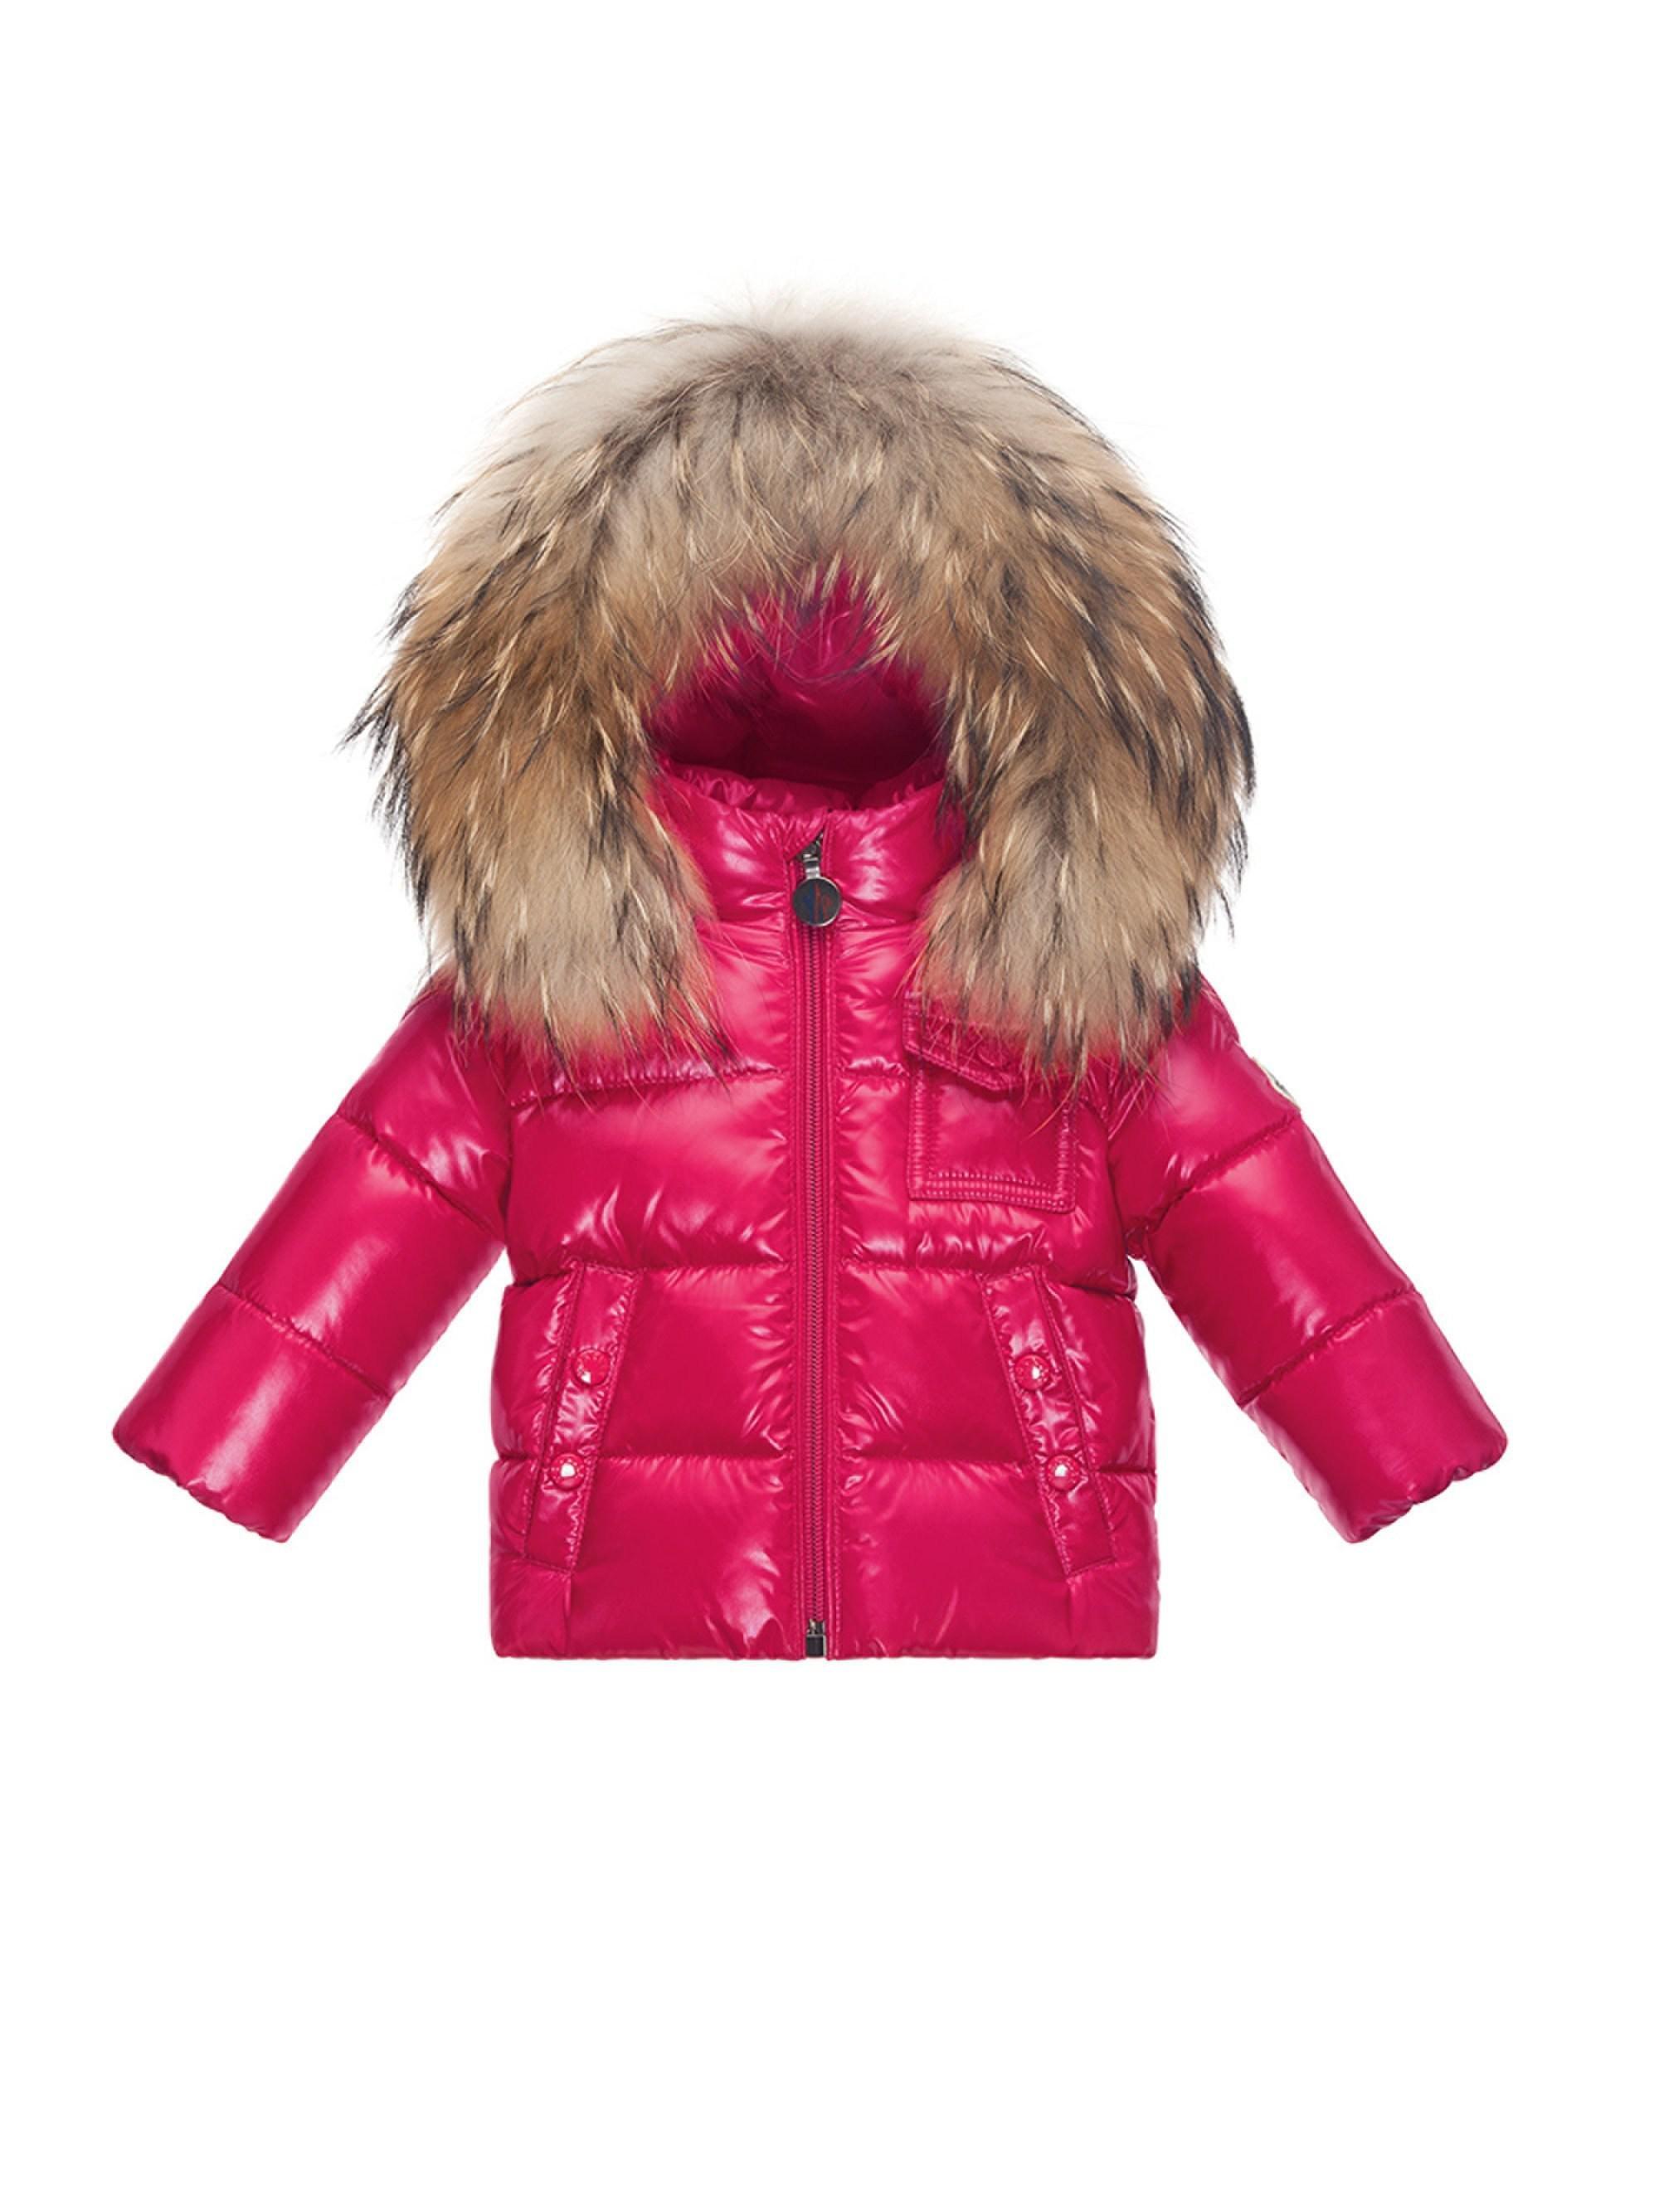 336ef67d3315 Moncler Baby Girl s Fur-trim Puffer Jacket - Lyst